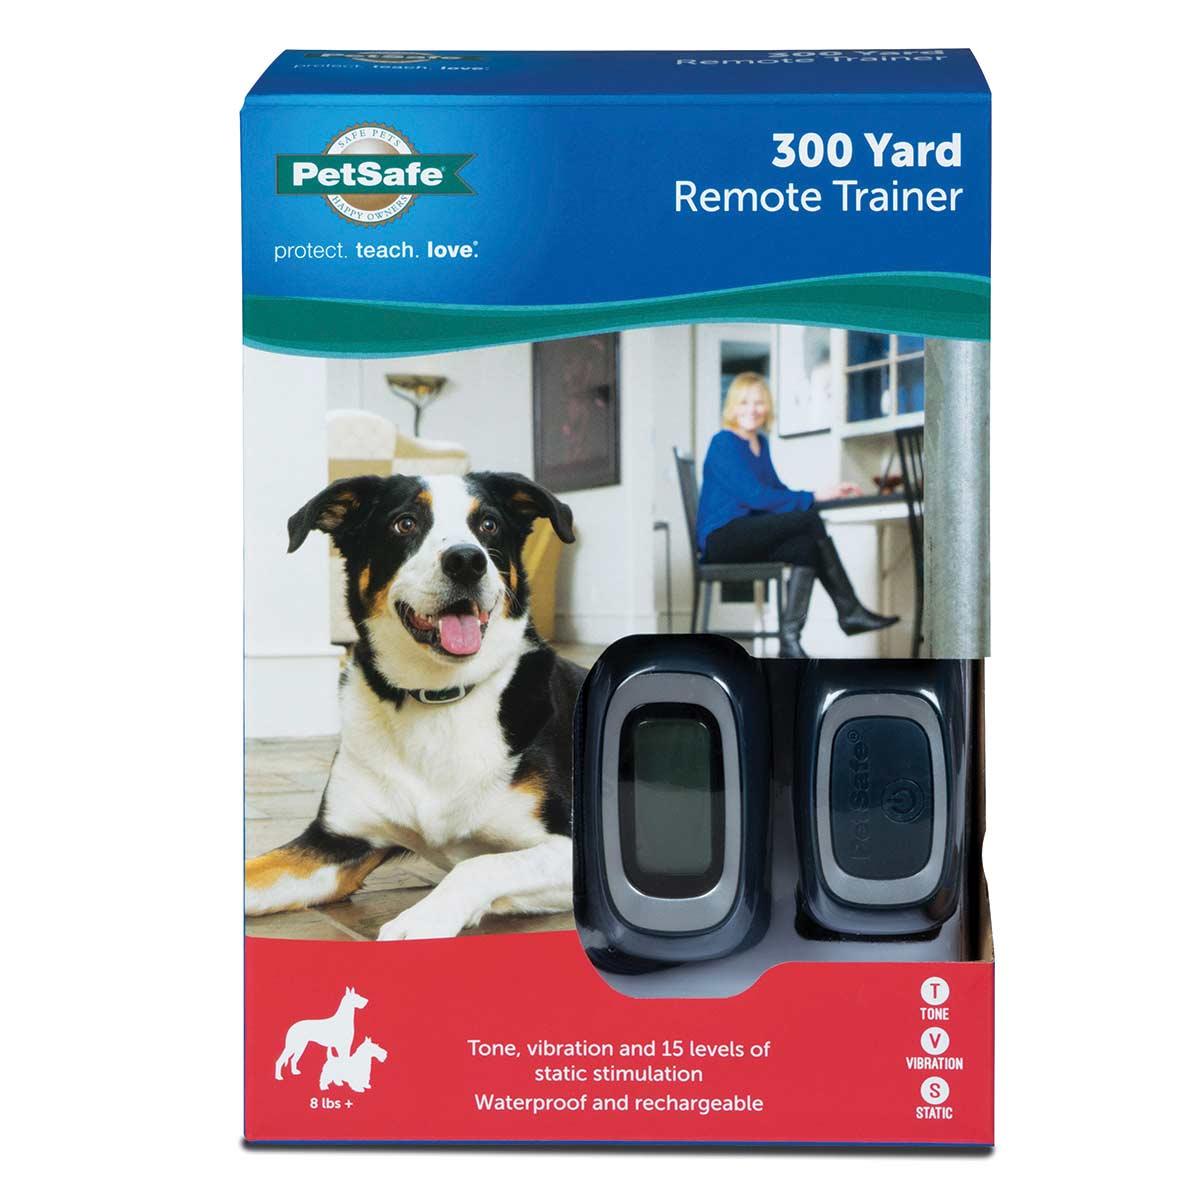 300 Yard PetSafe Yard Remote Trainer